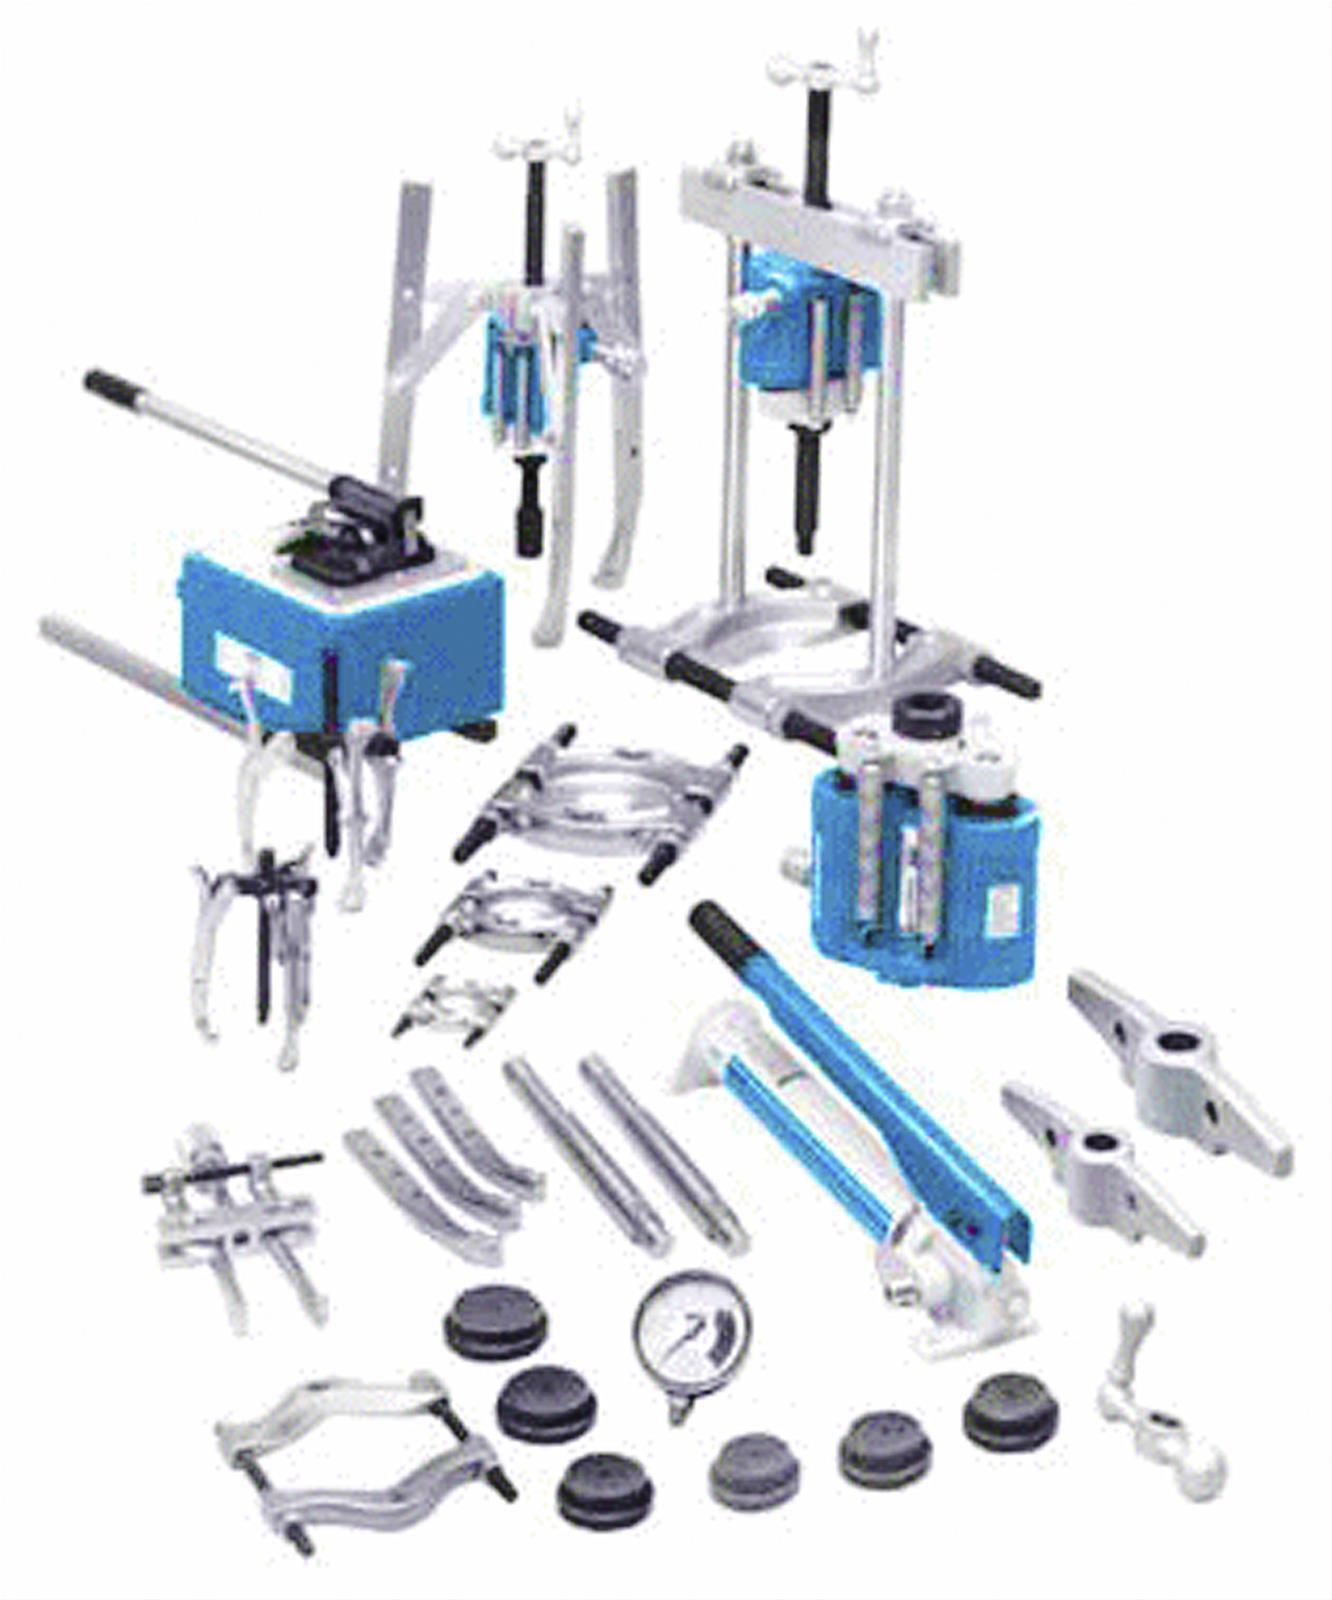 Otc Puller Parts : Otc ton hydraulic puller sets free shipping